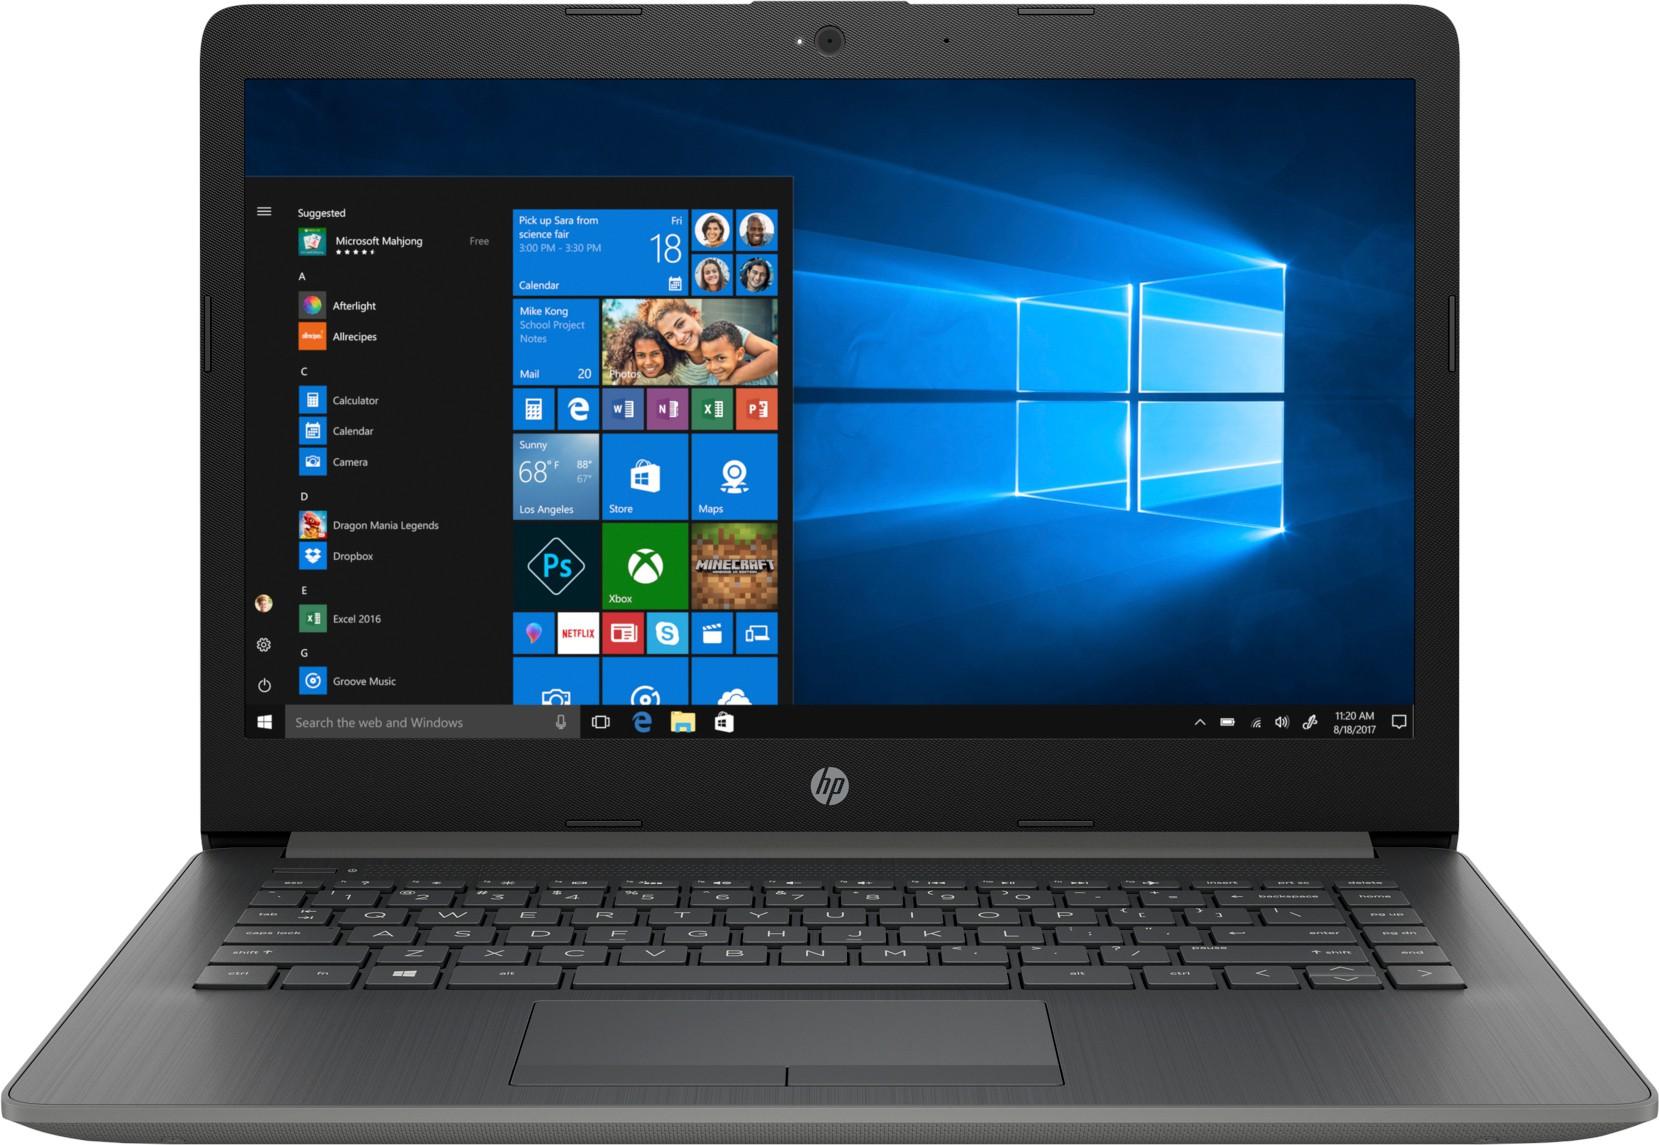 HP 14q Core i3 7th Gen 14q-cs0006tu Laptop Image